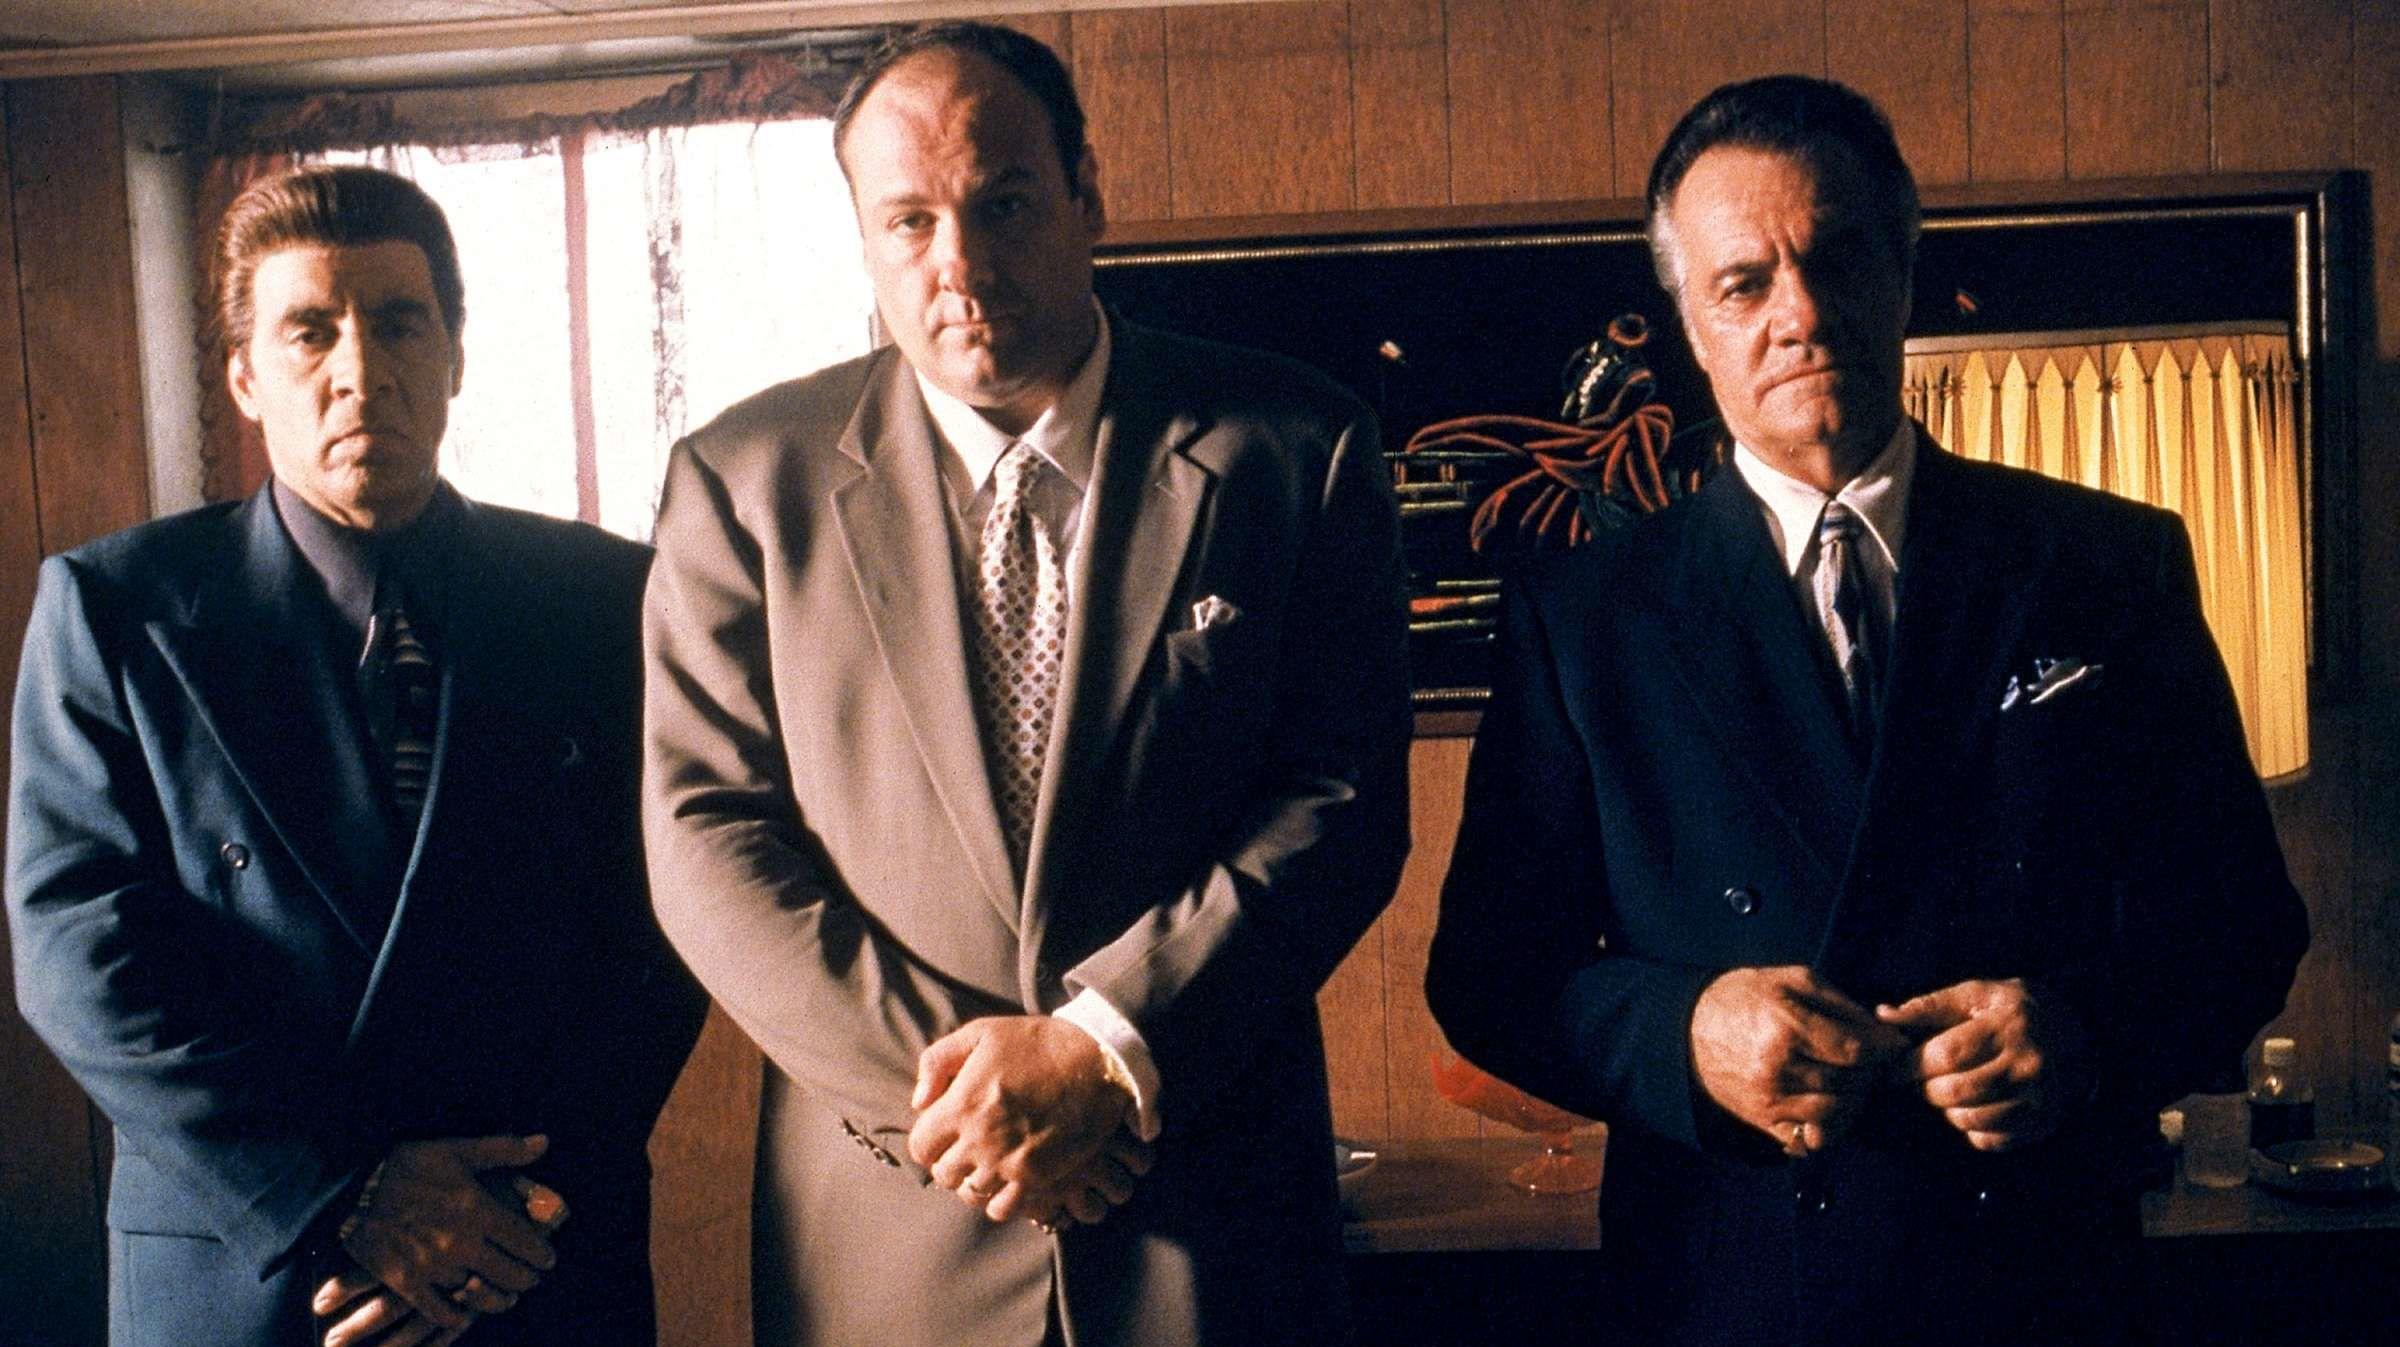 <em>The Sopranos</em>-Themed <em>Monopoly</em> Lets You Buy, Sell, or Build Houses on the Bada Bing!